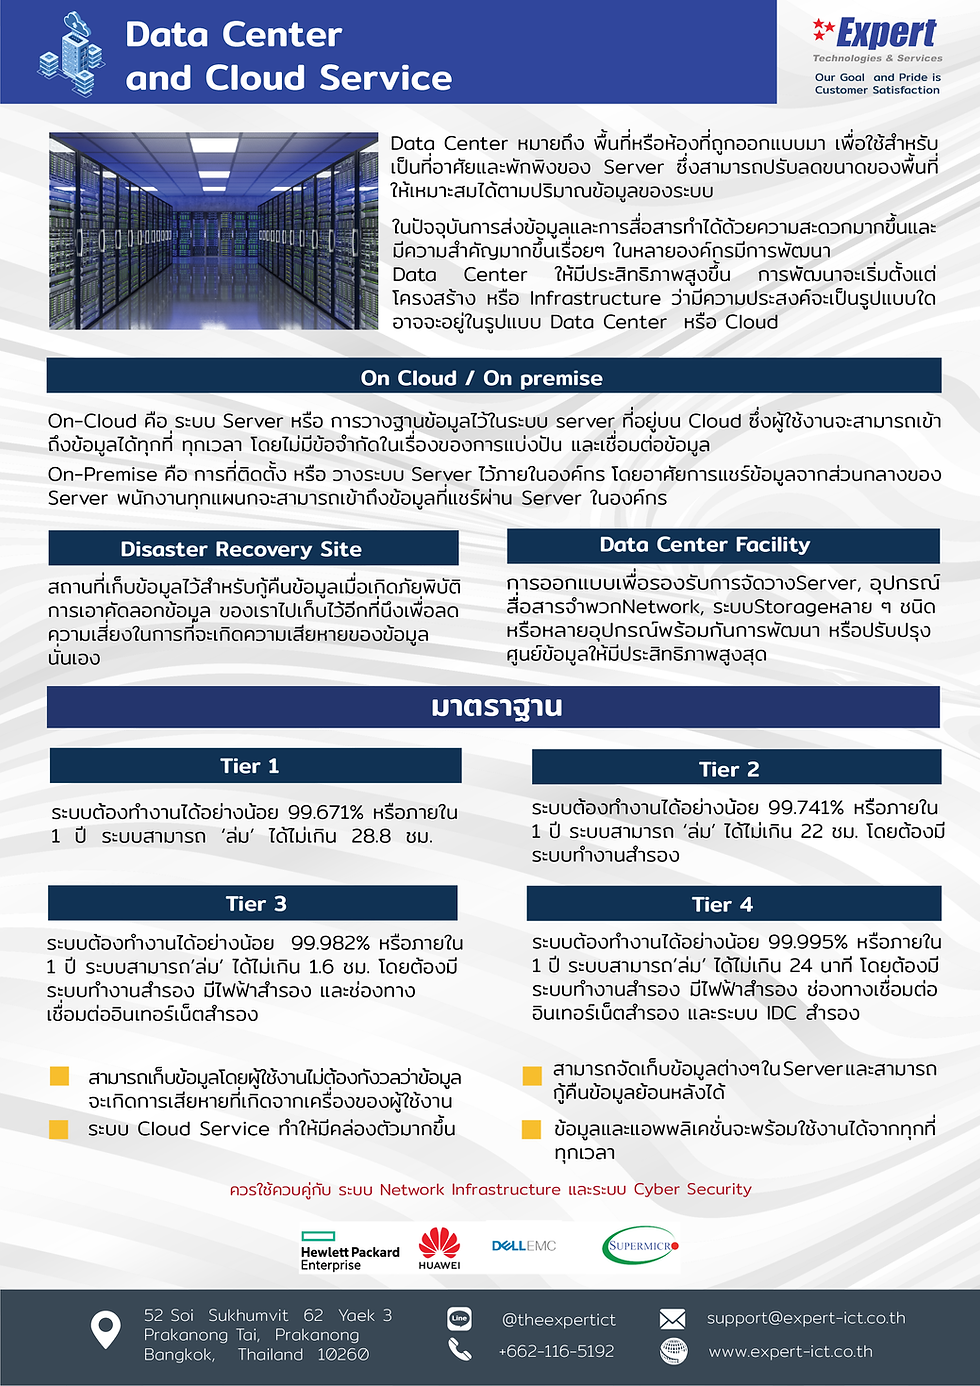 datacenter-01.png